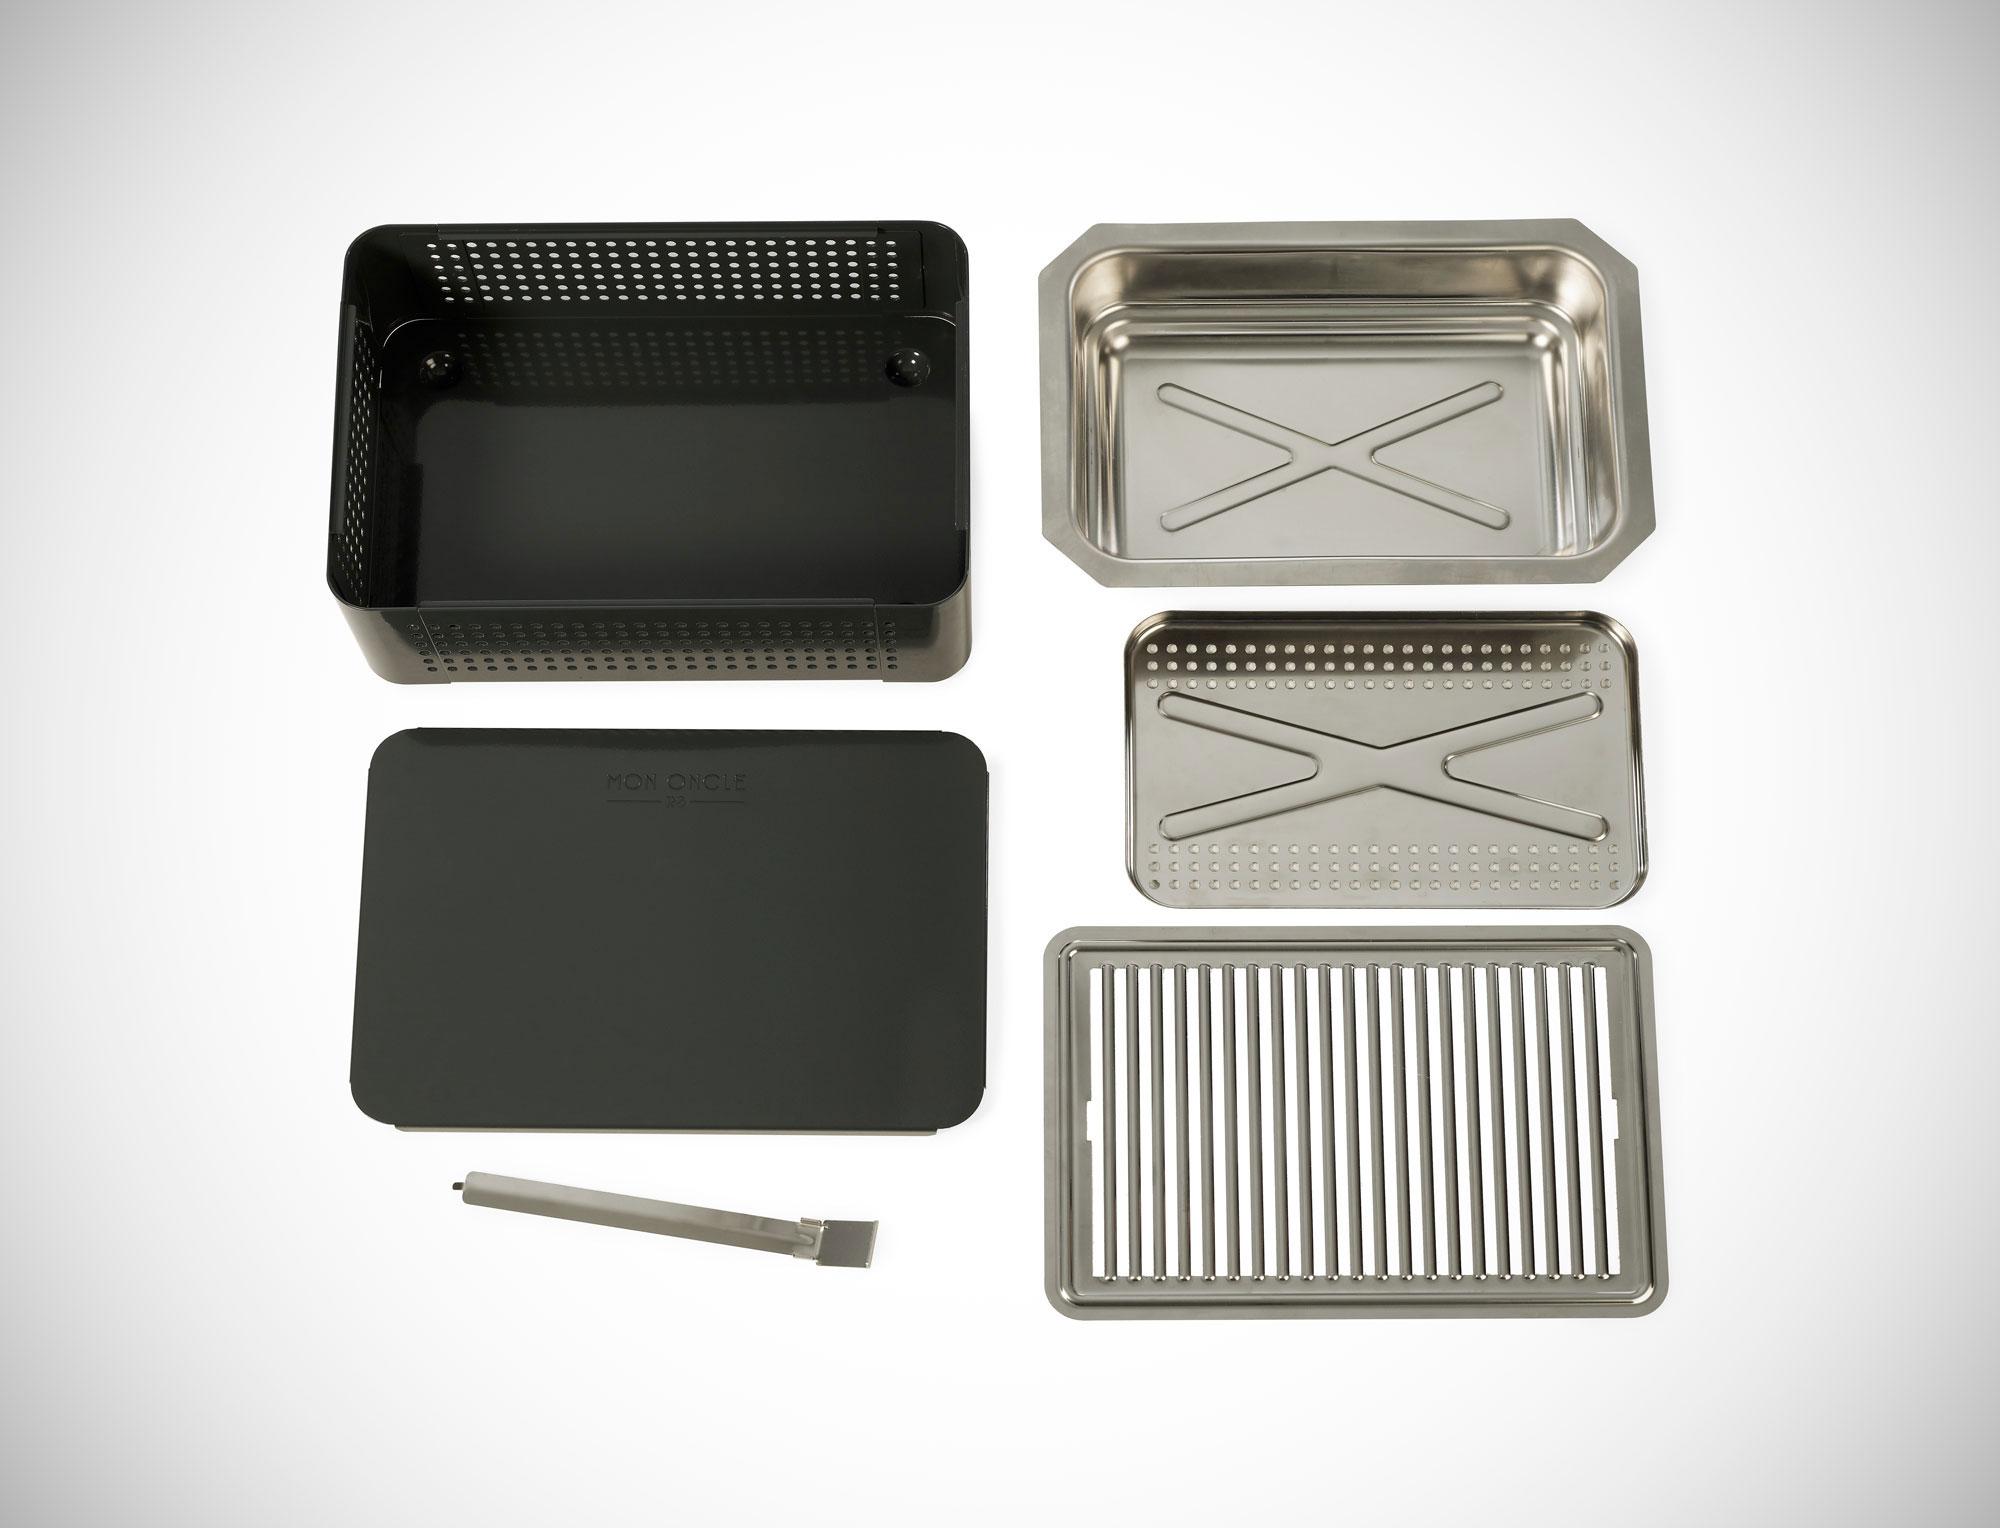 mon oncle portable bbq grill blue gessato. Black Bedroom Furniture Sets. Home Design Ideas